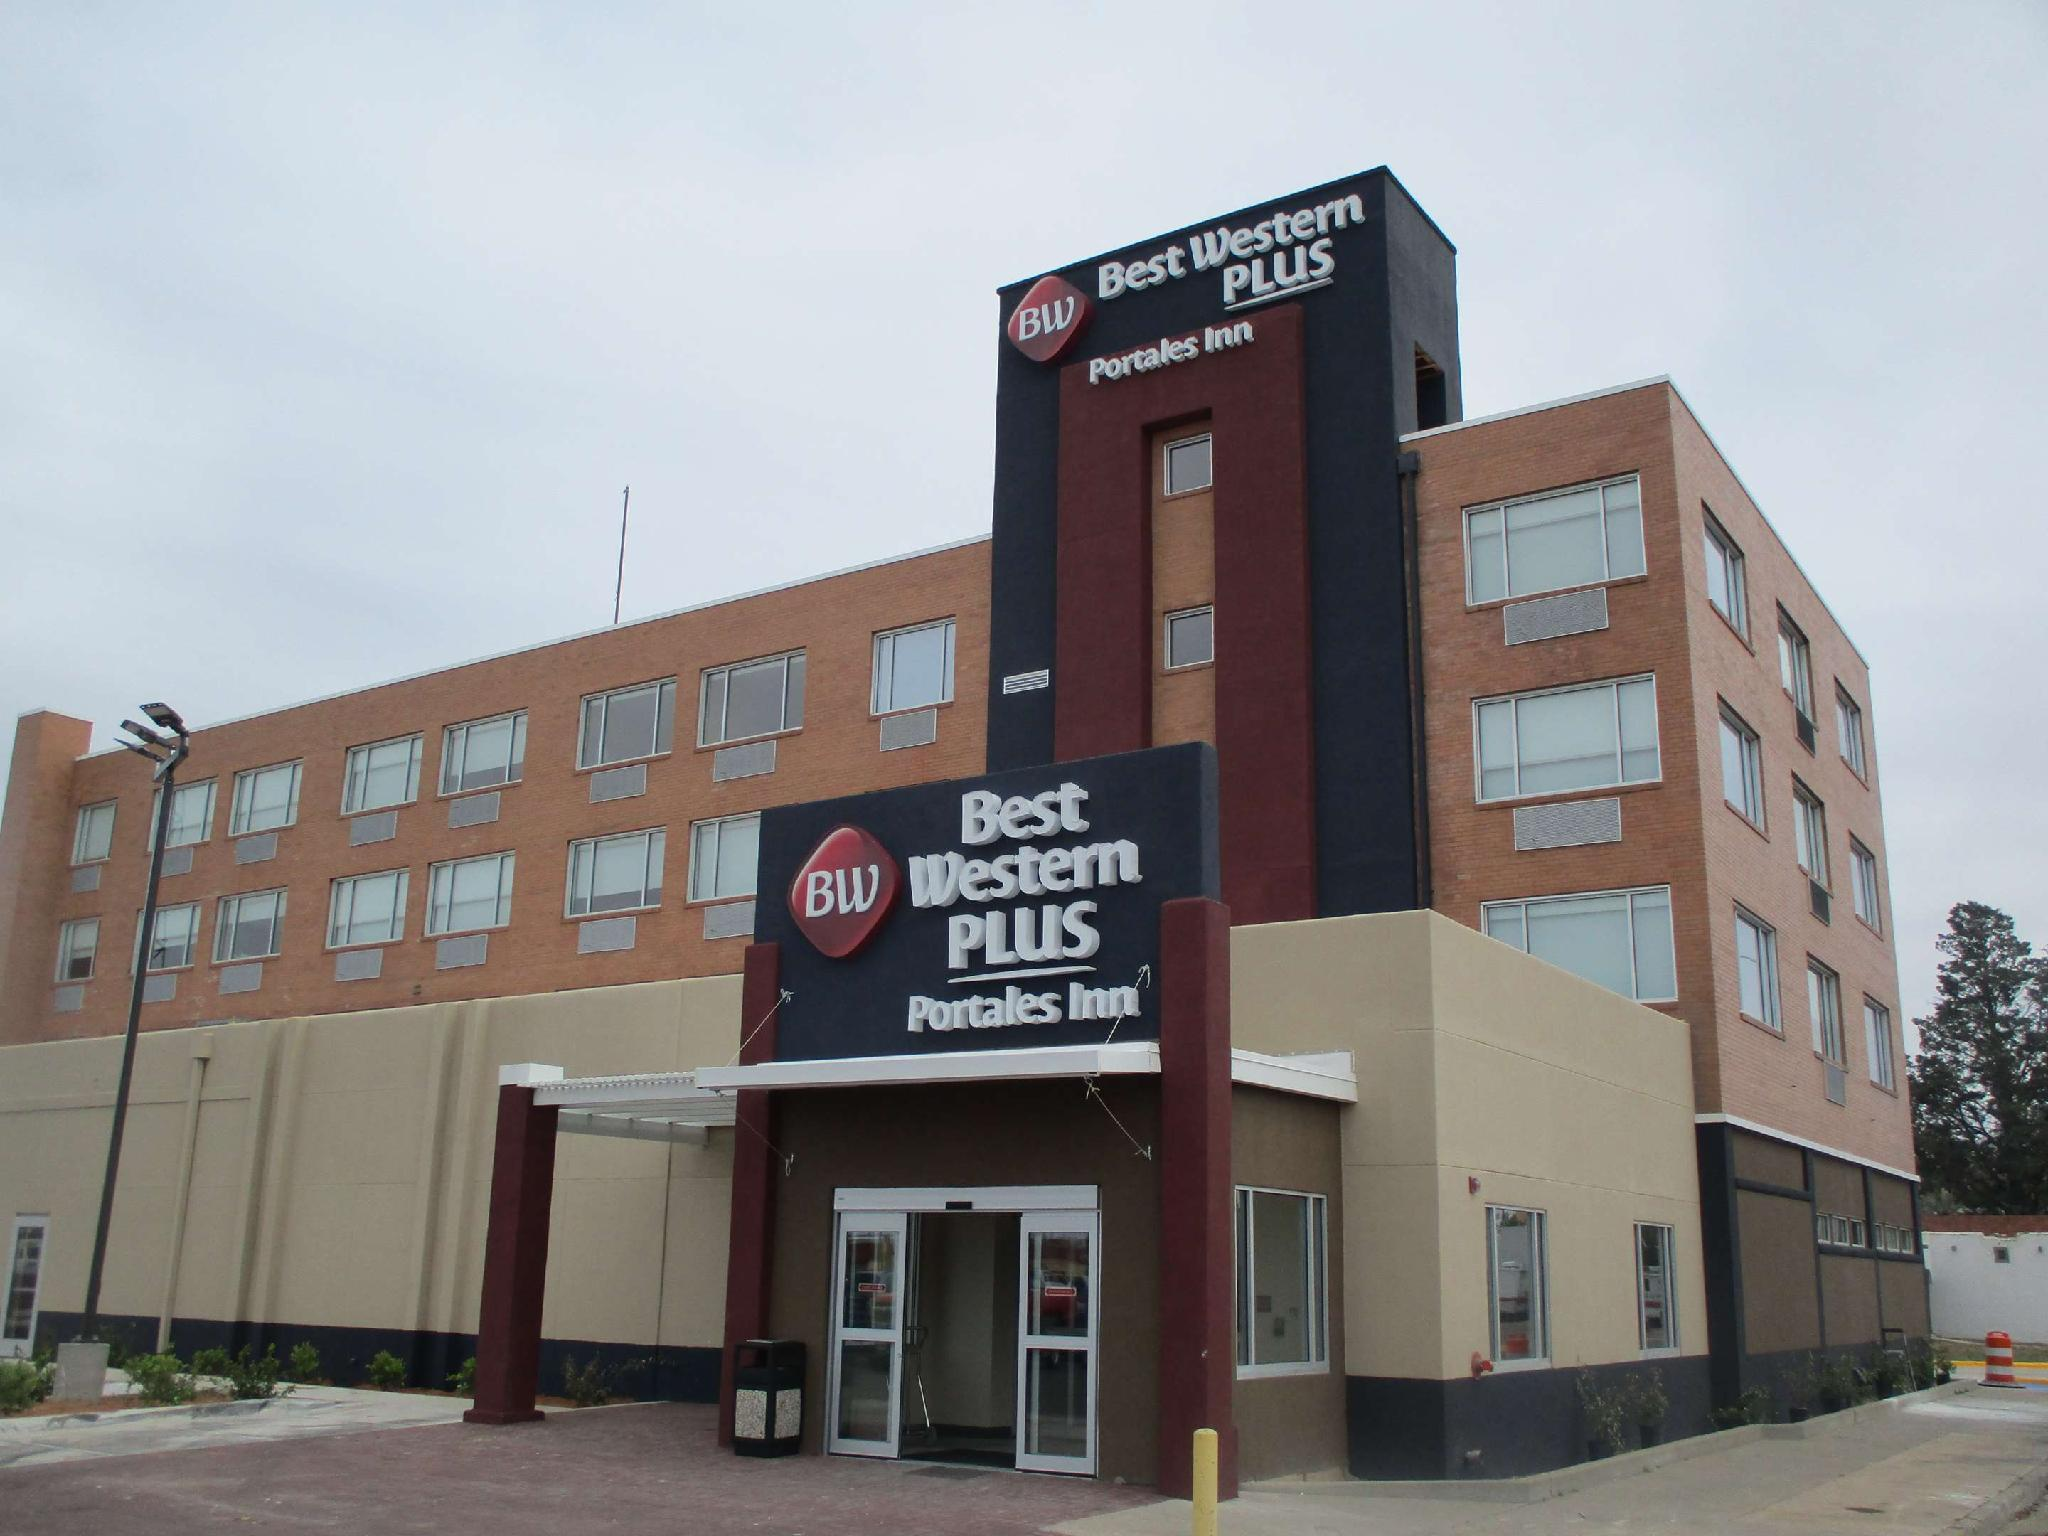 Best Western Plus Portales Inn